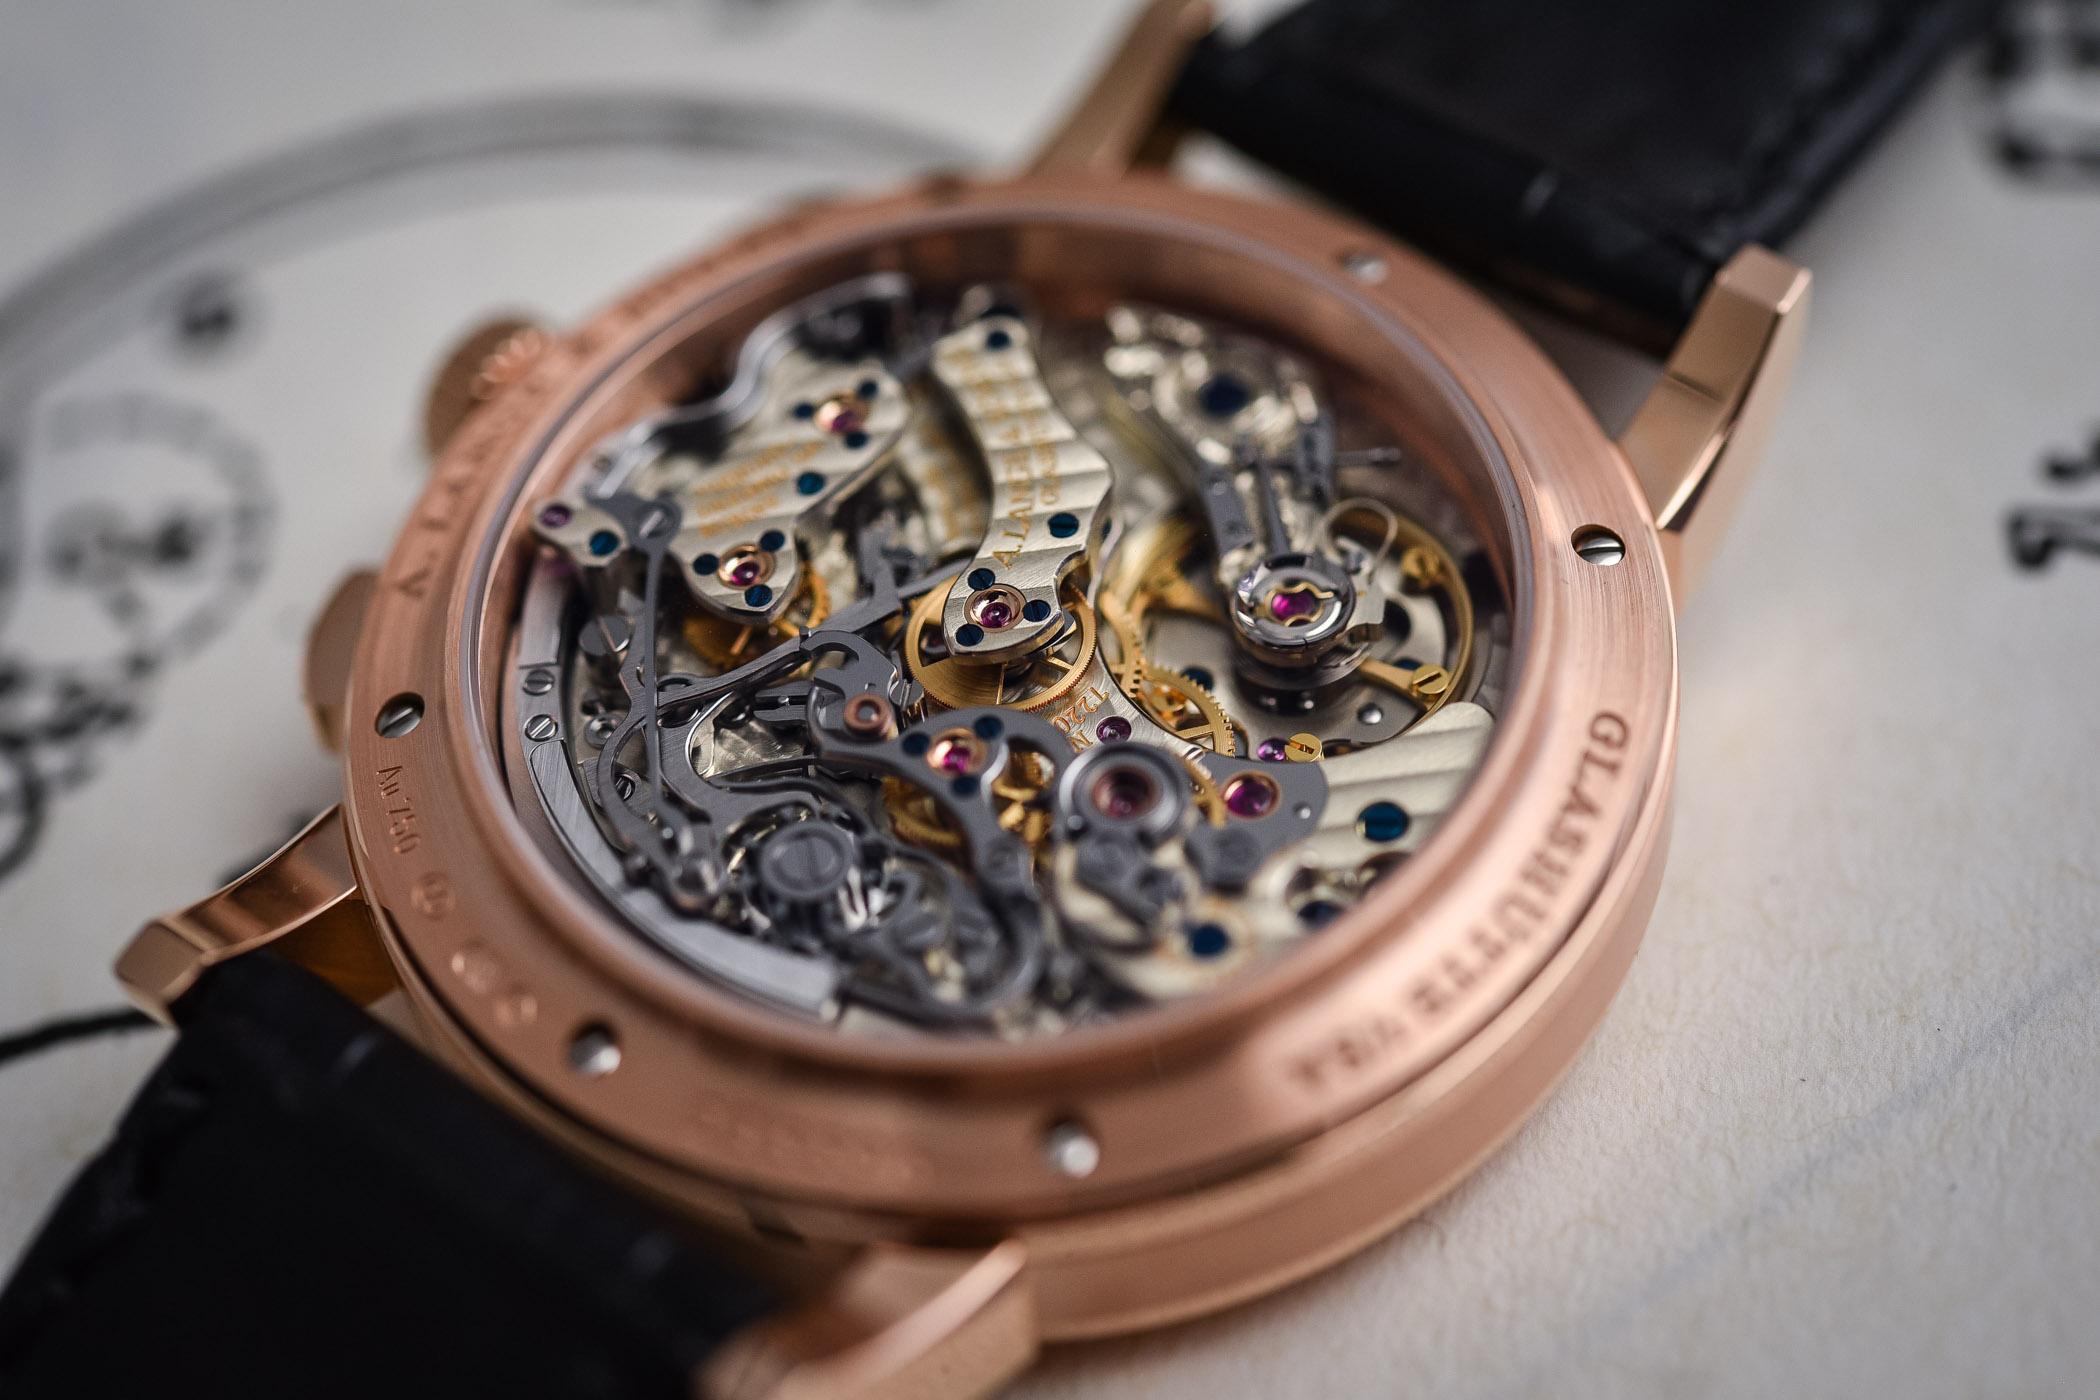 A Lange Sohne 1815 Chronograph Black Dial Rose Gold - SIHH 2018